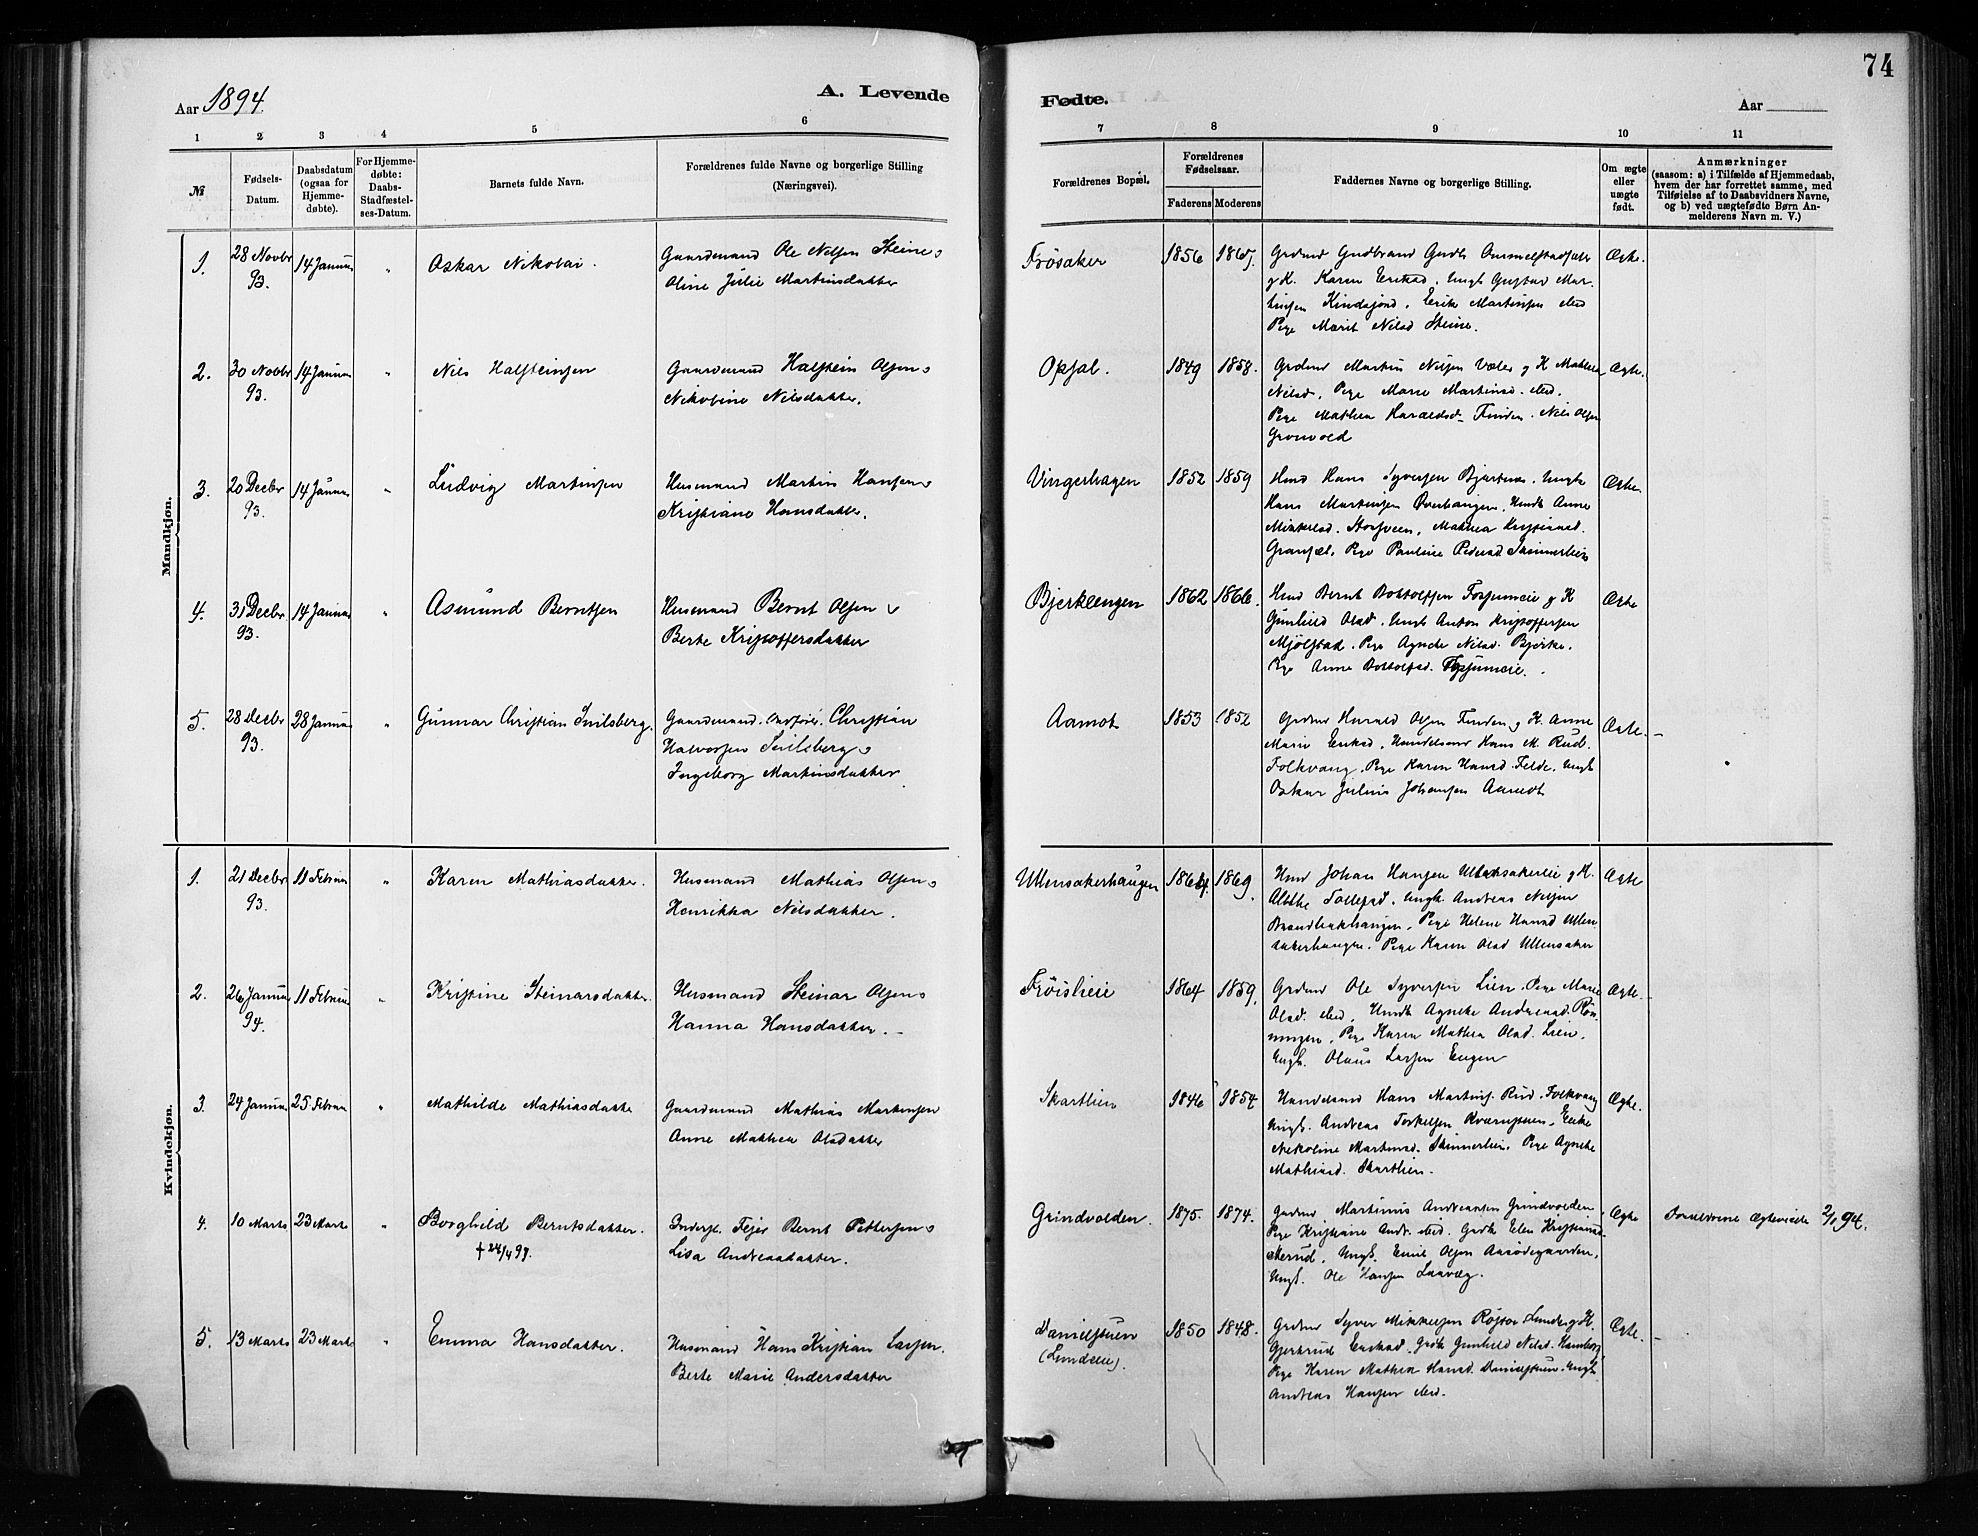 SAH, Nordre Land prestekontor, Ministerialbok nr. 4, 1882-1896, s. 74